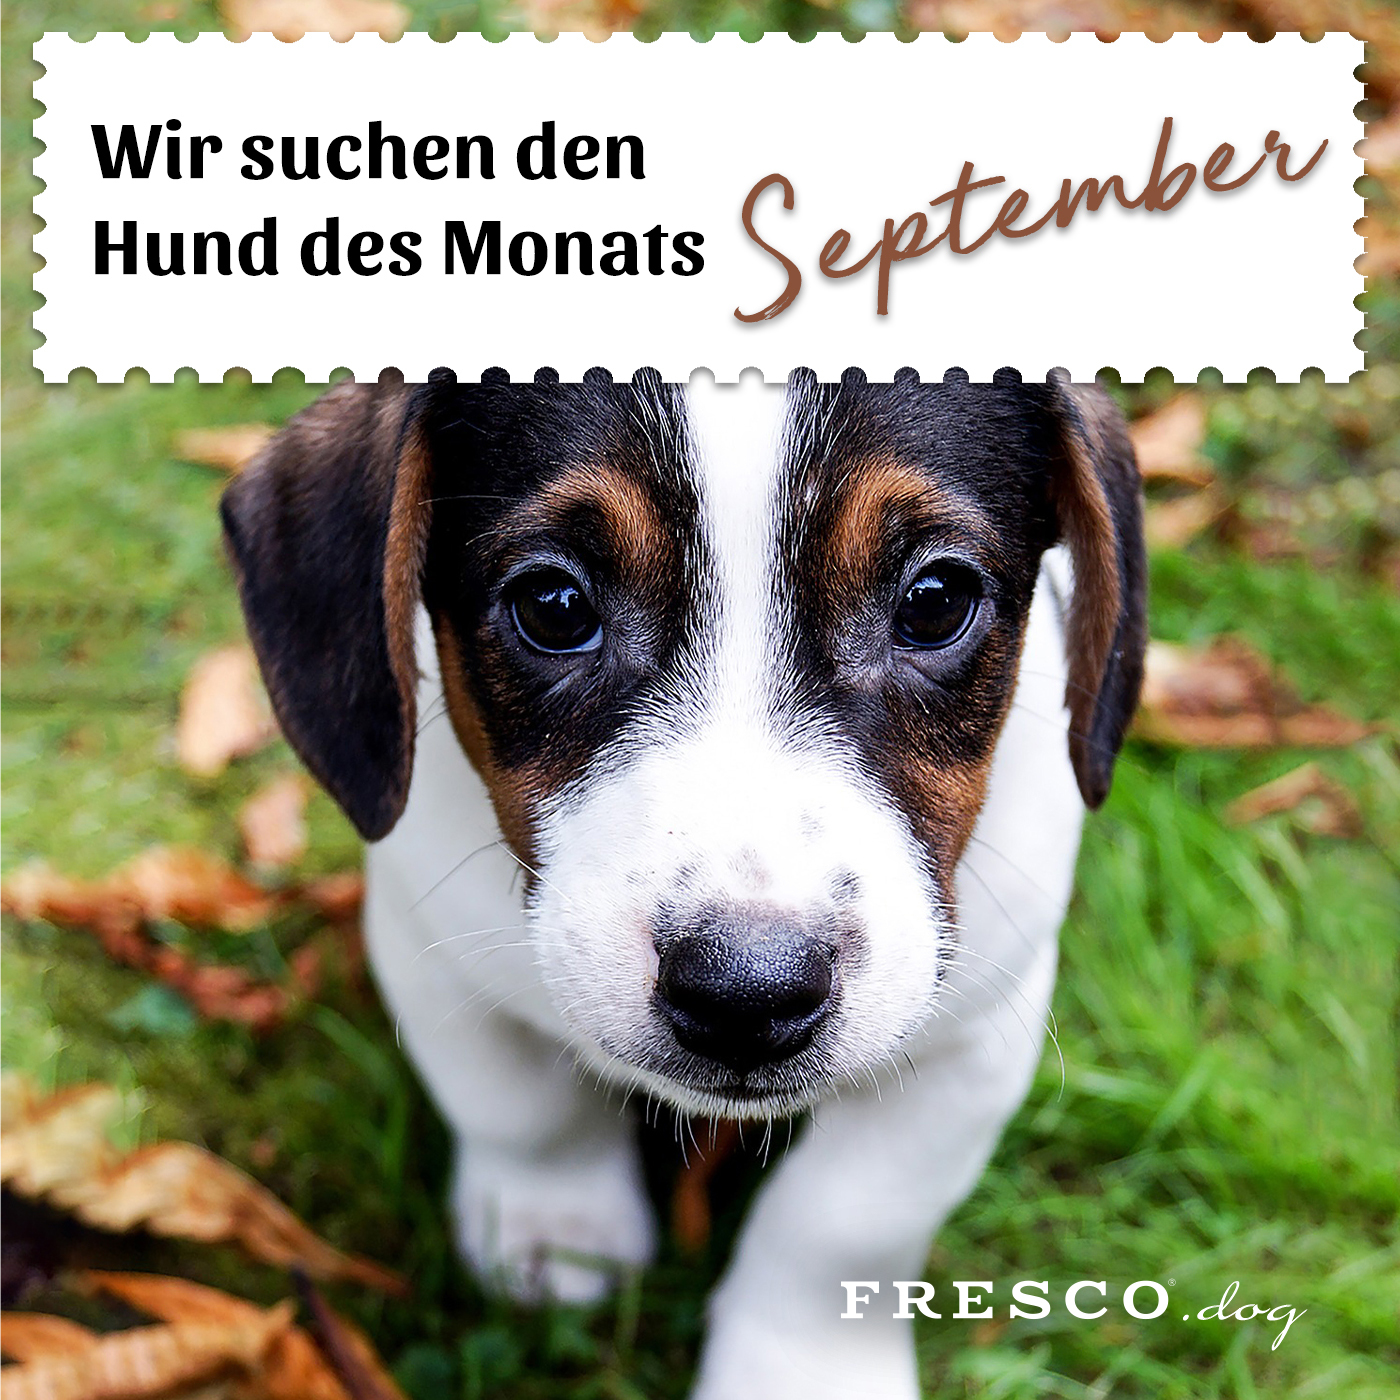 Hund-des-Monats-September5f636a79aba18